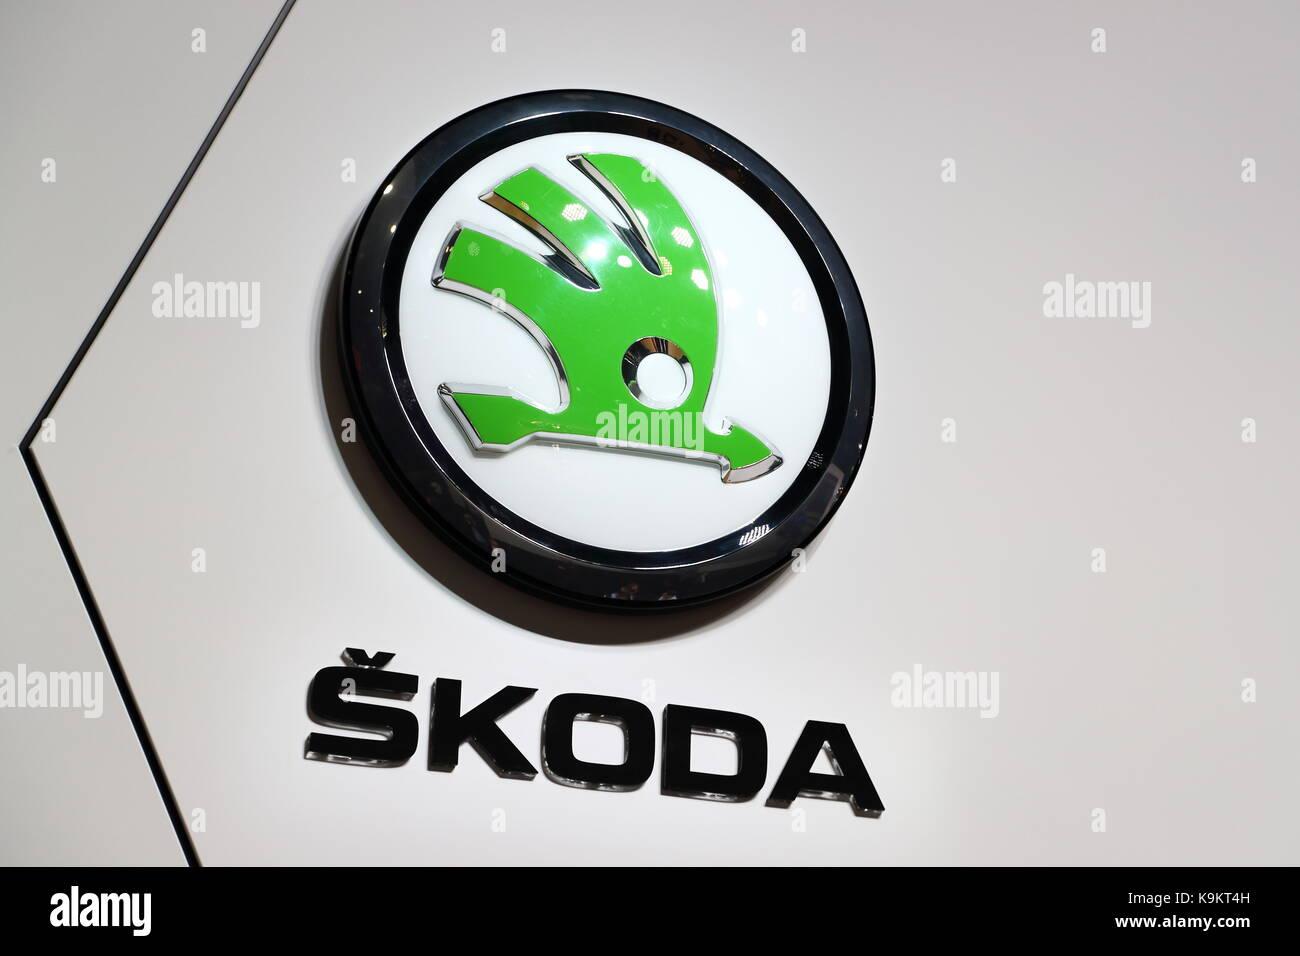 Skoda Emblem Stock Photos Amp Skoda Emblem Stock Images Alamy